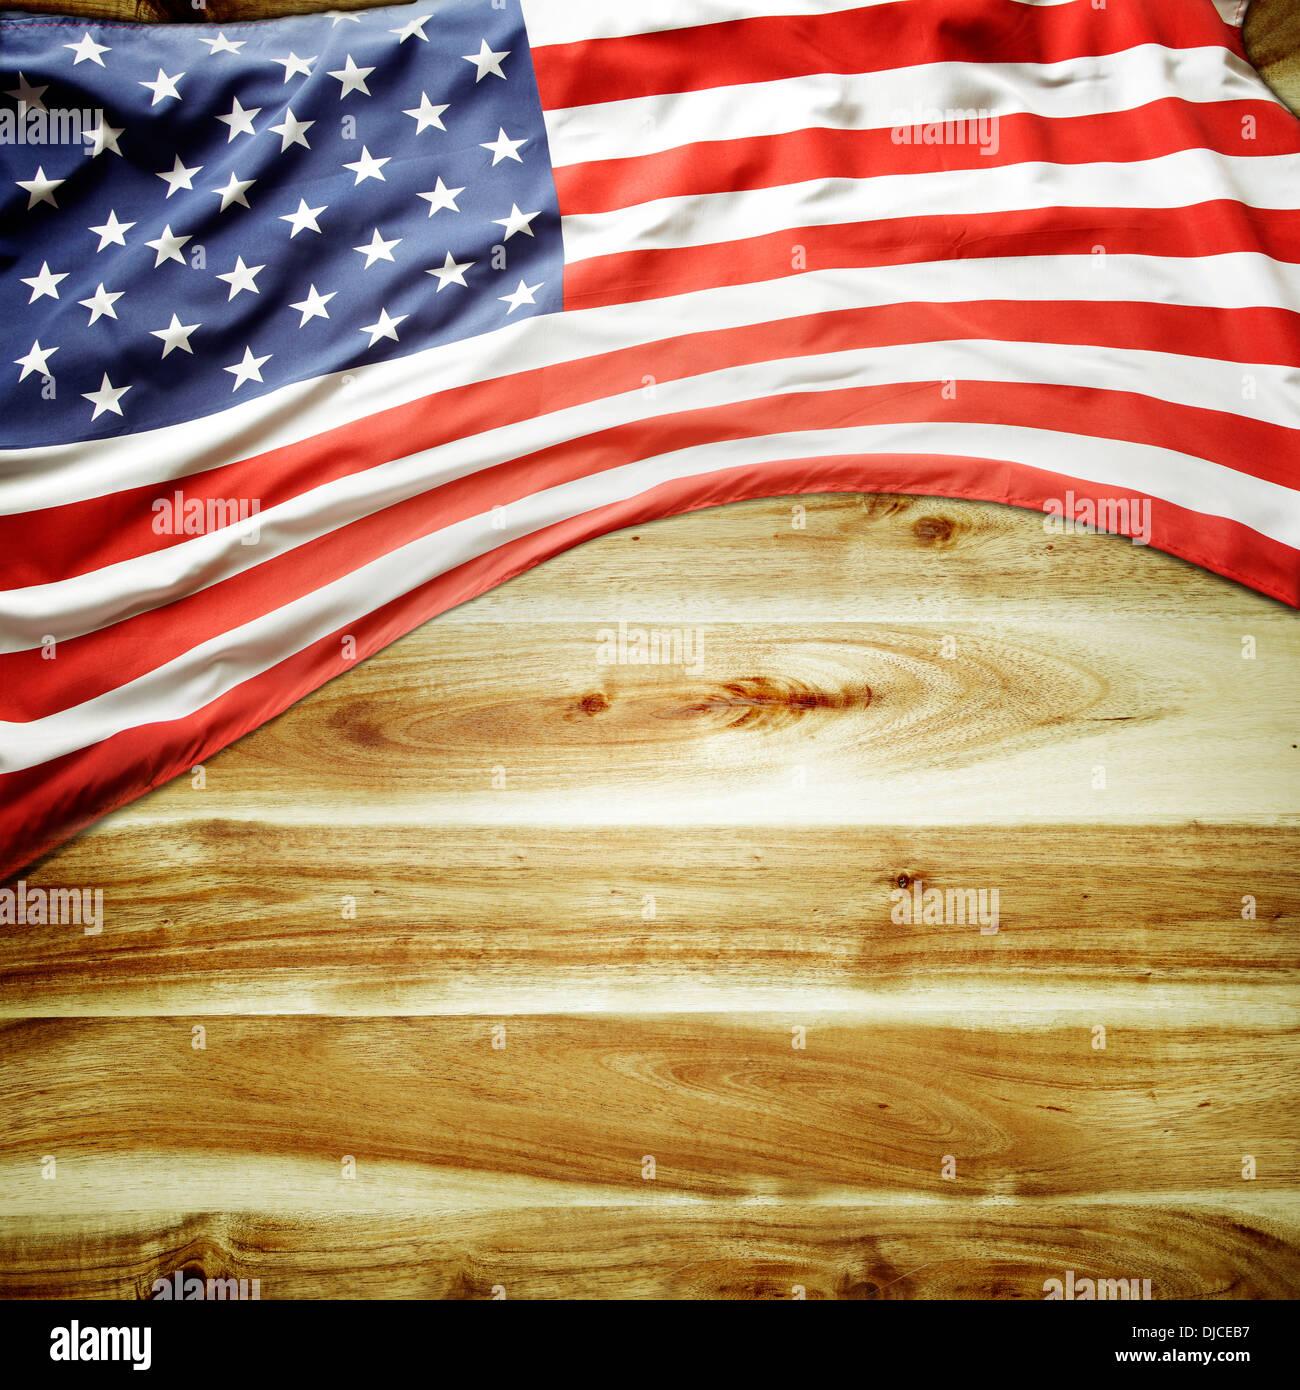 Closeup Ripple American Flag Stock Photos & Closeup Ripple American ...